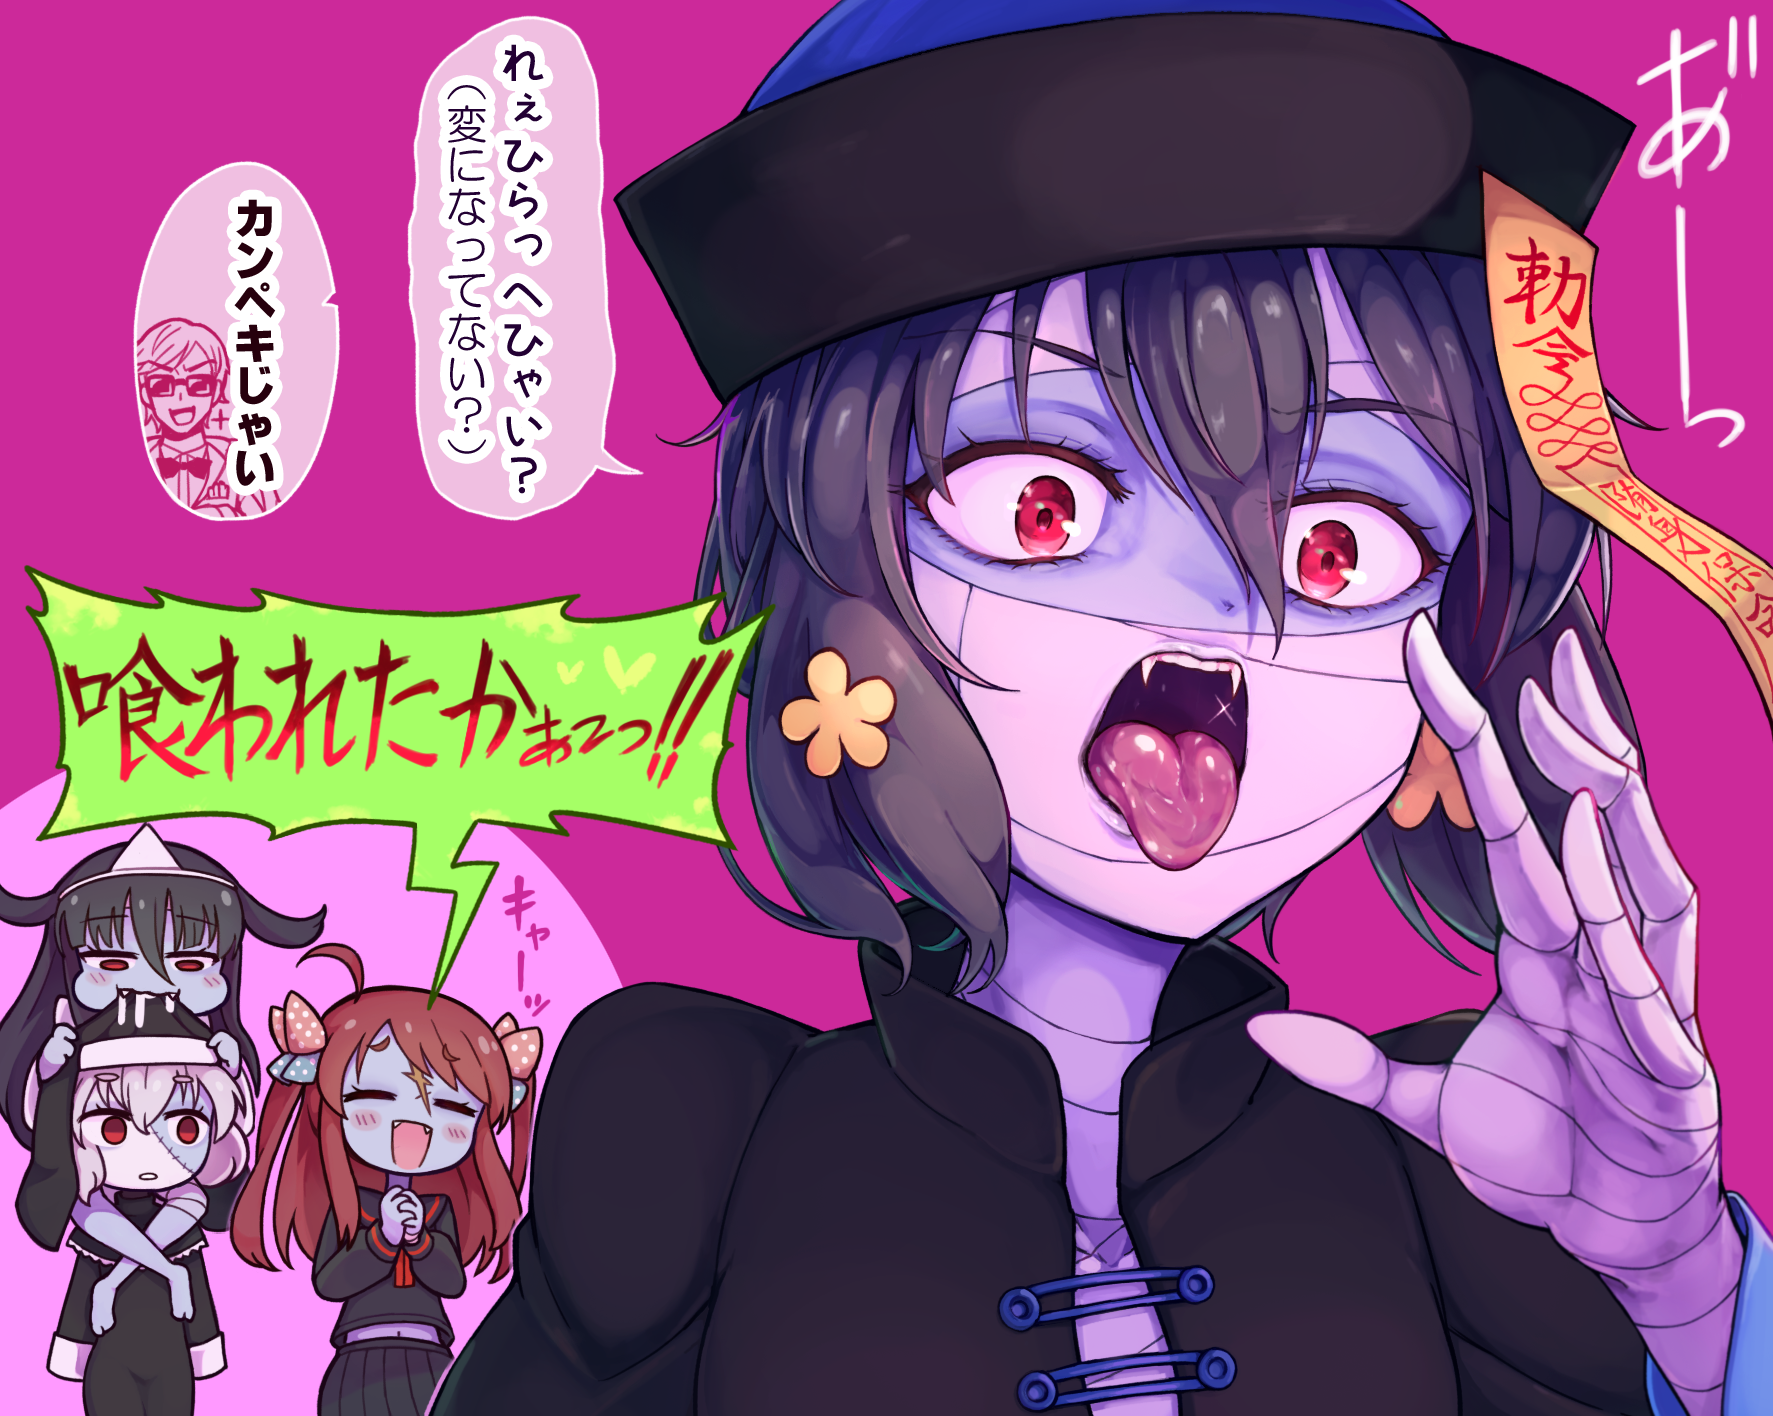 Zombieland Saga Monster Girl Zombies Kanji School Uniform JK Sailor Uniform Nuns Habit Long Hair Sho 1773x1416